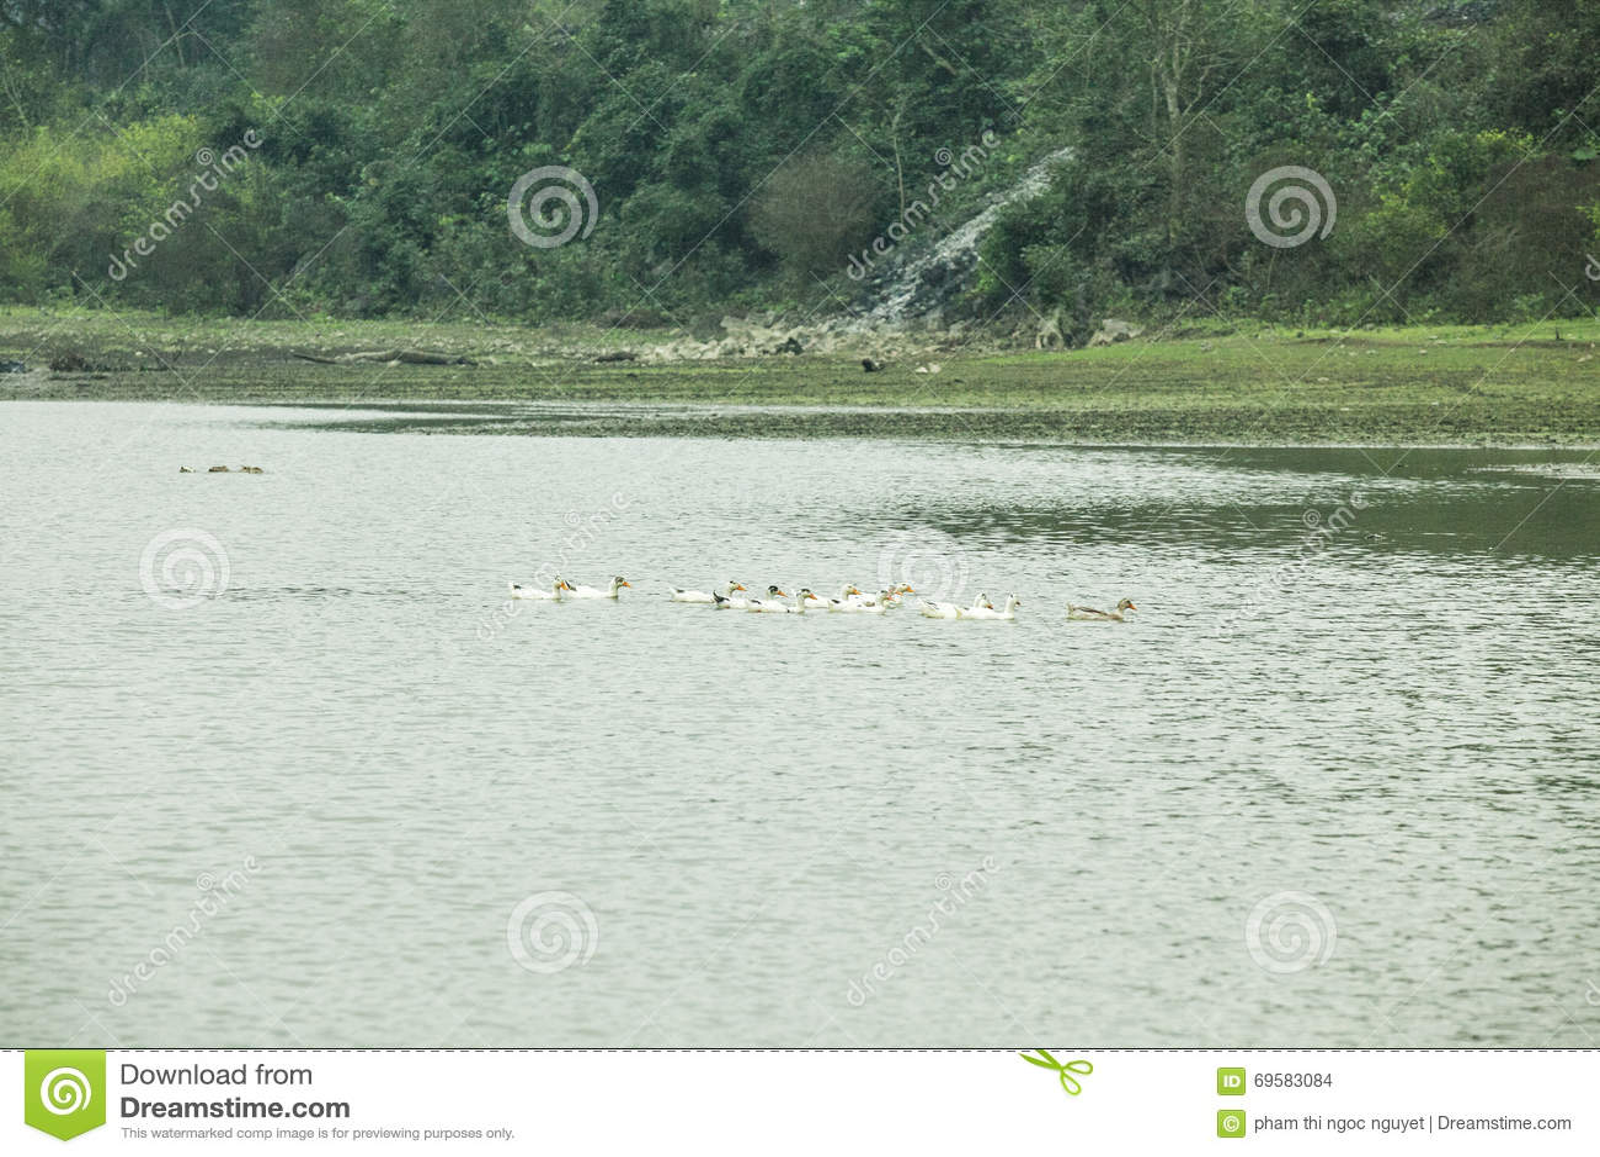 Noong kaczka na jeziorze i jezioro